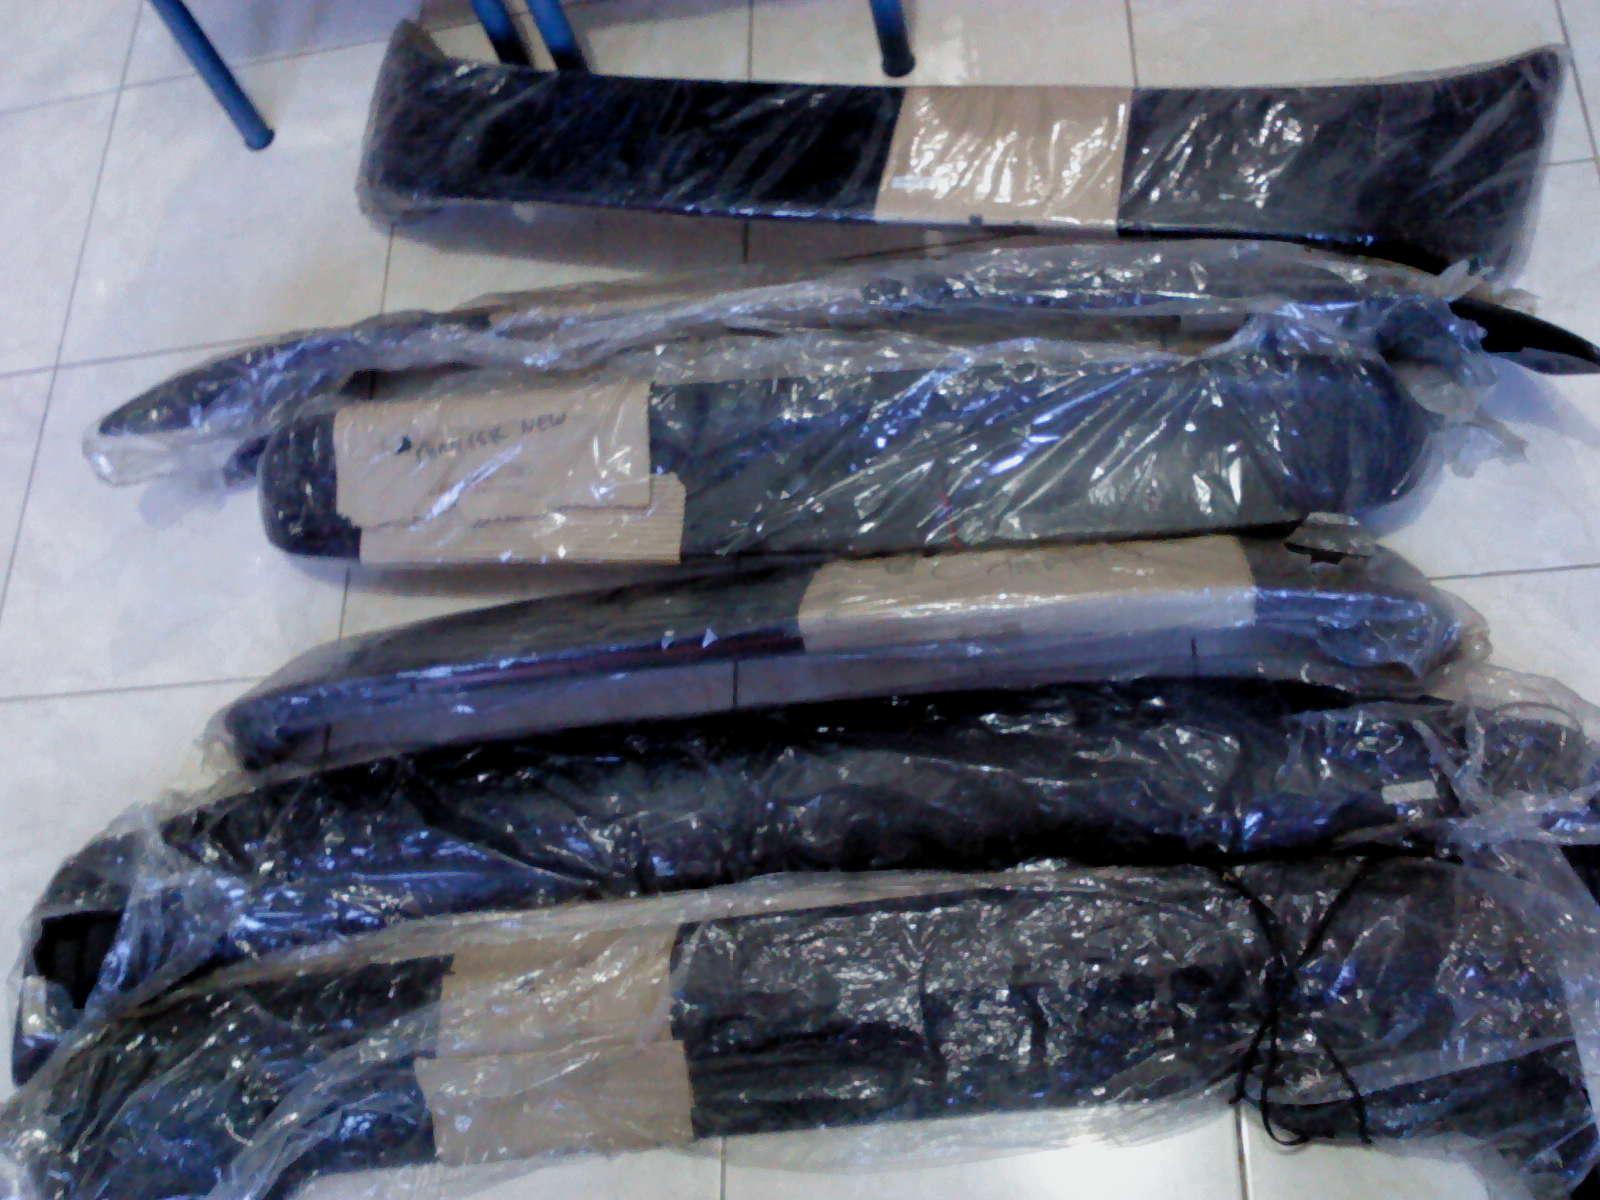 Baru : spoiler mobil PANTHER,MAZDA,KUDA,FUTURA,MITSUBISHI KUDA -2.bp.blogspot.com